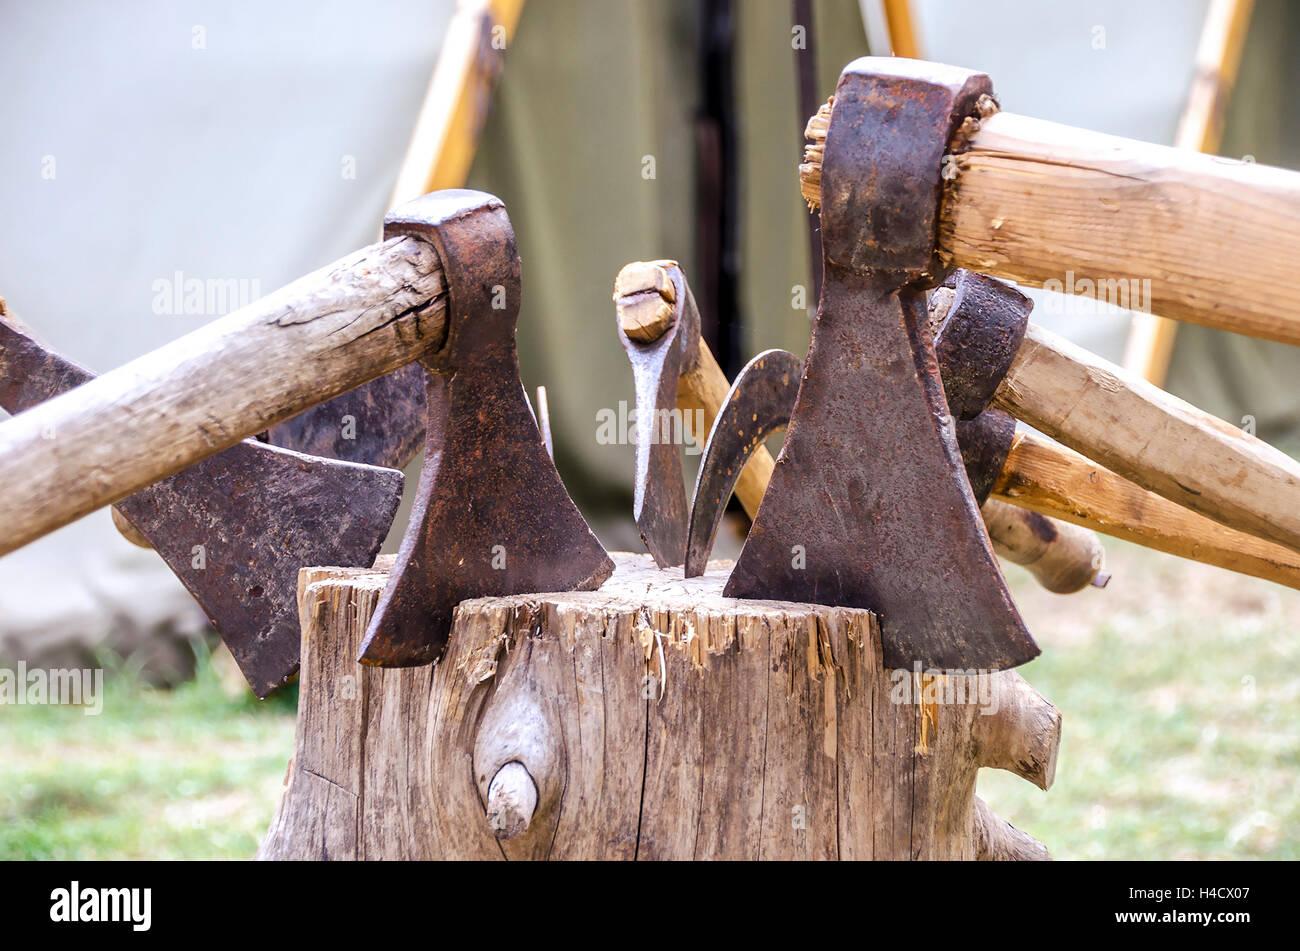 axes firewood woodcutter stump log stub - Stock Image